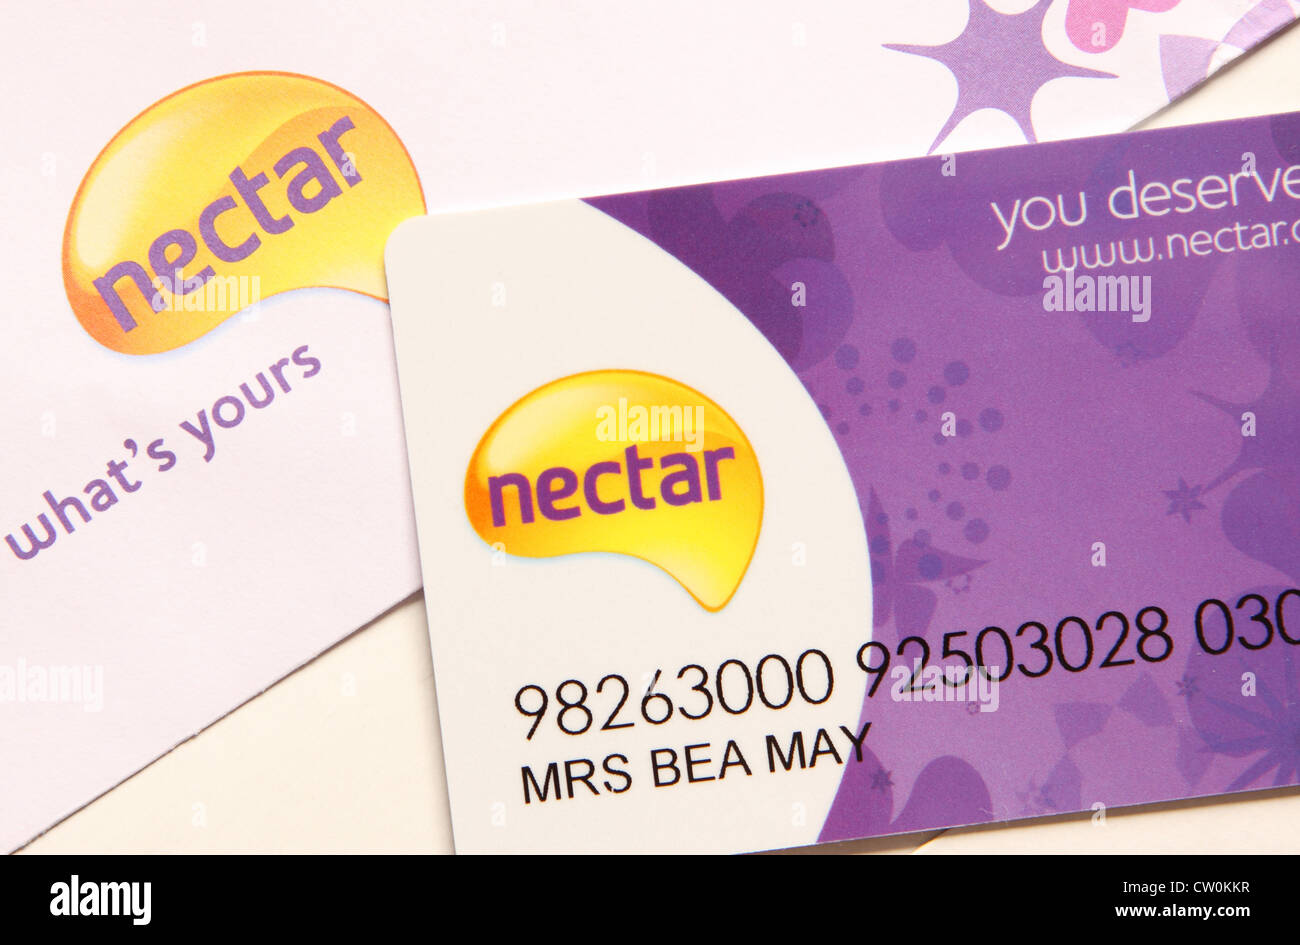 Nectar reward points card Stock Photo